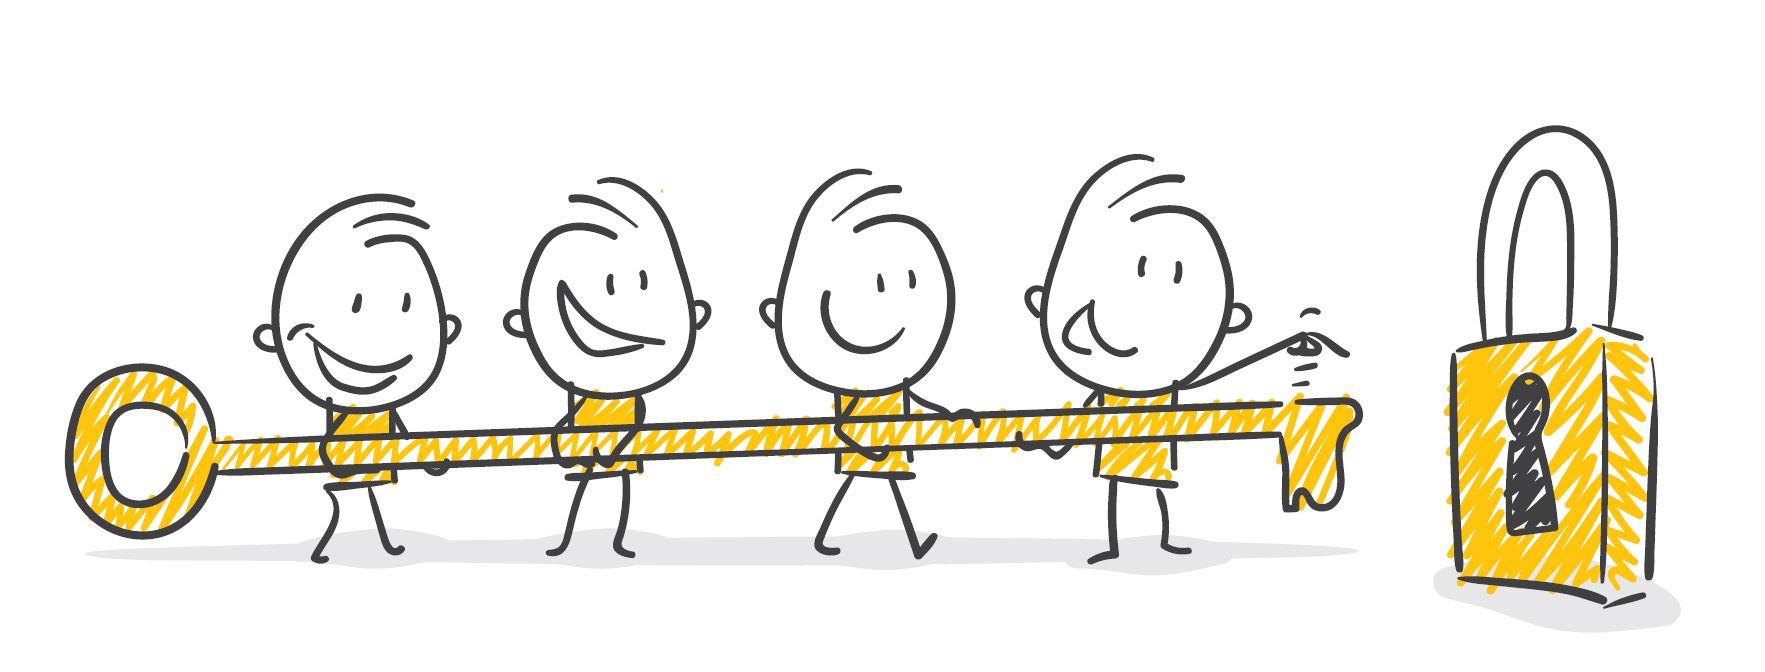 Shared  Work  unlocks collaboration